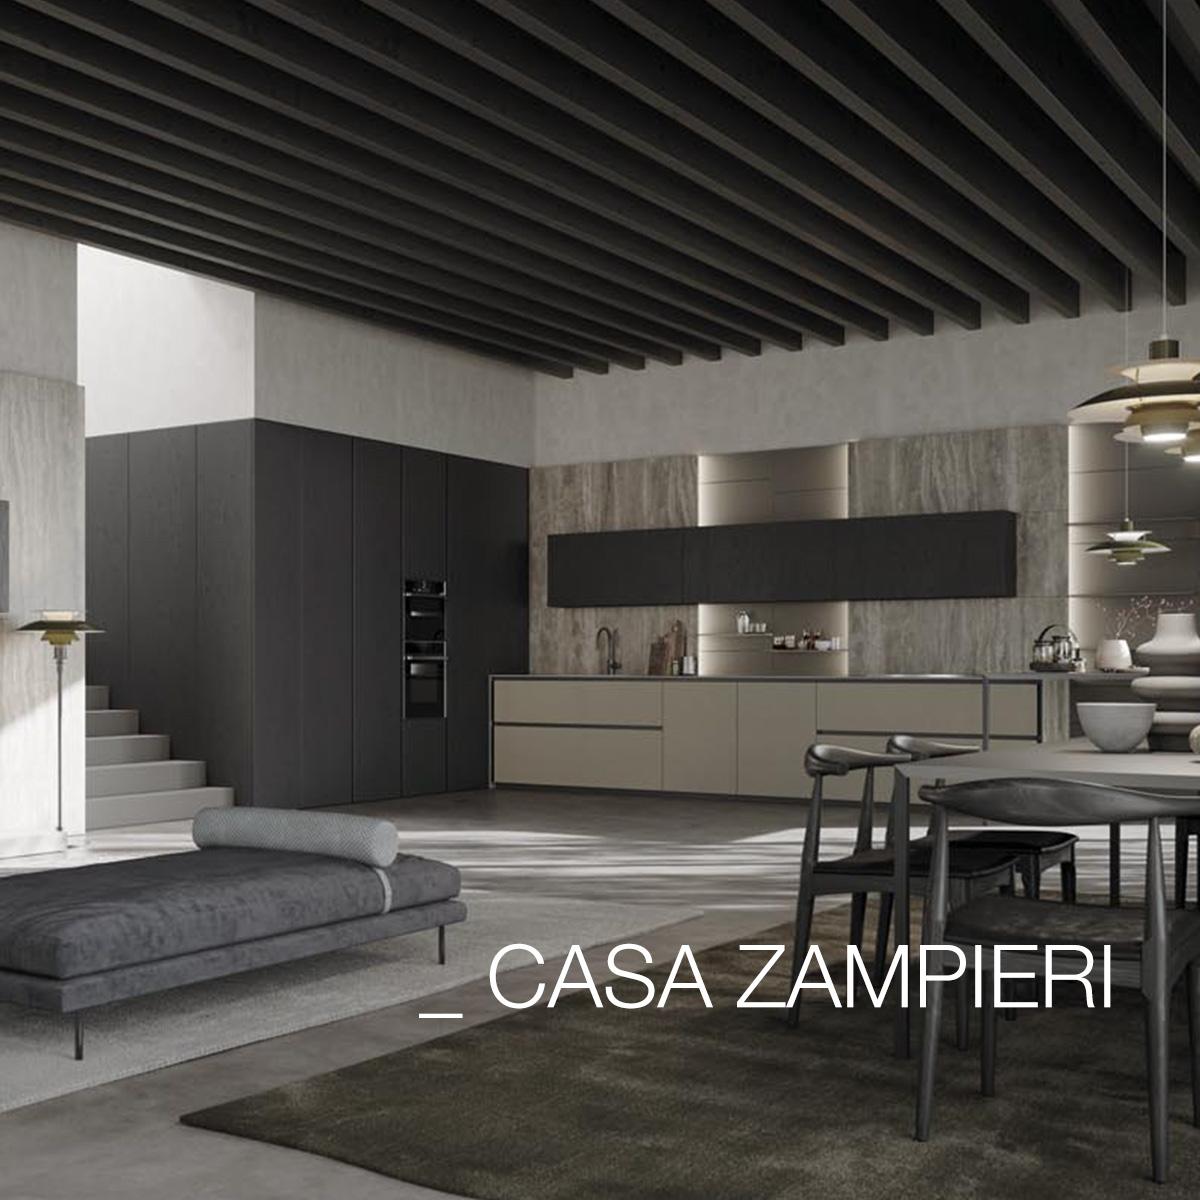 Casa Zampieri